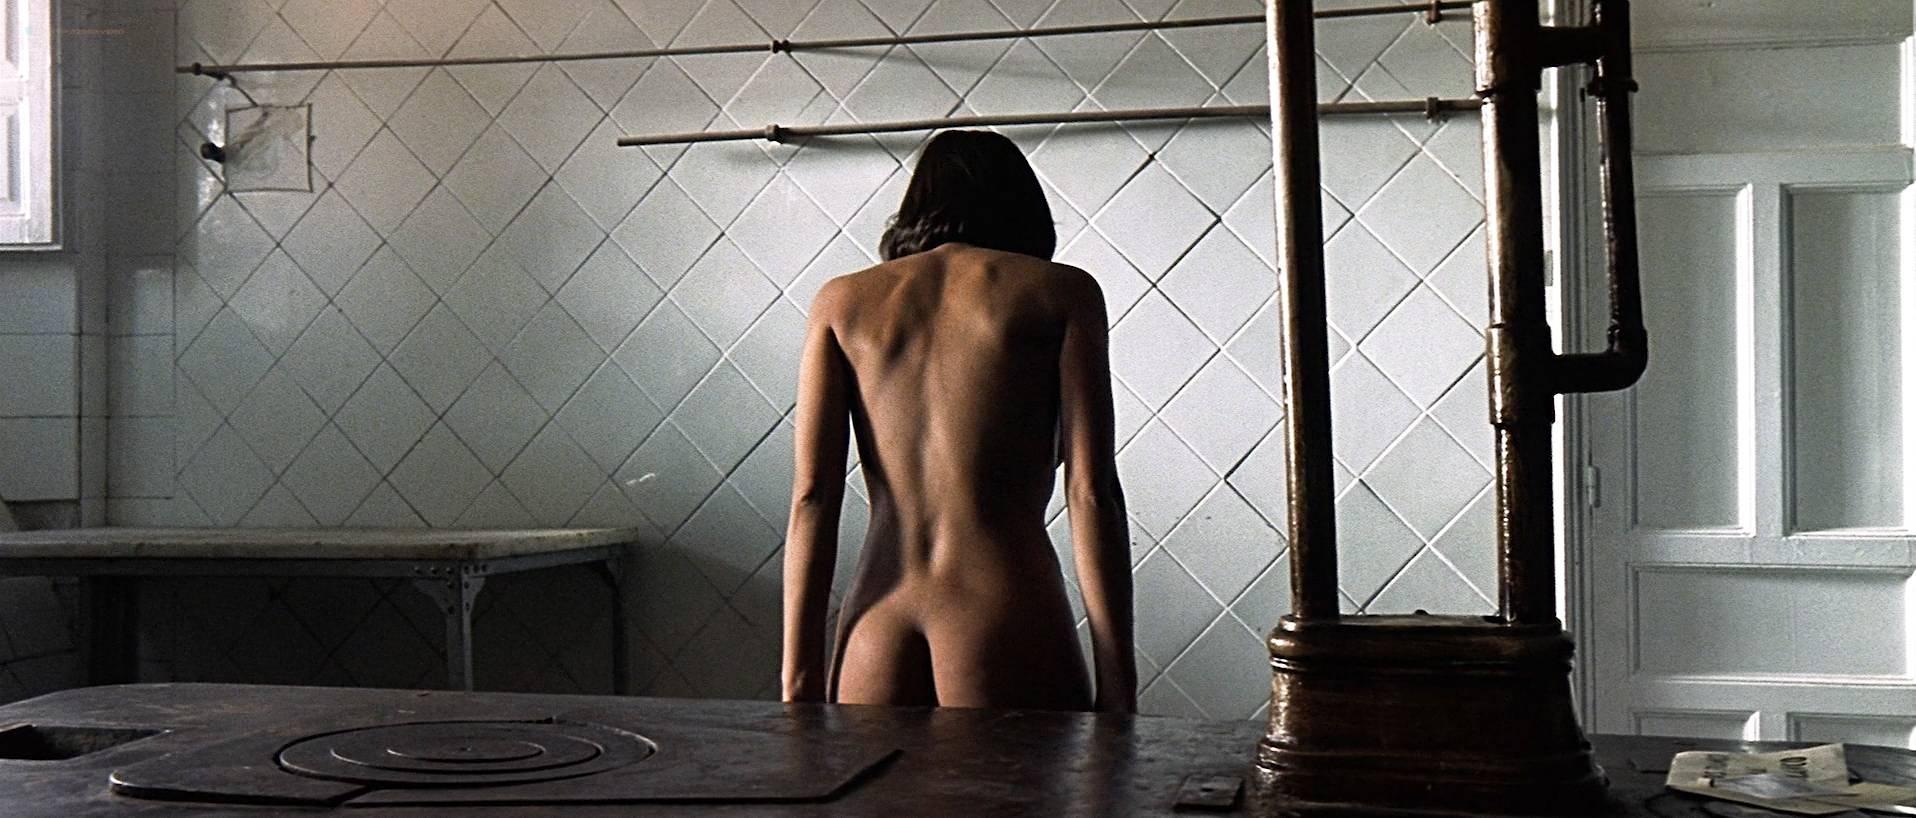 Verónica Sánchez nude topless and butt - Las 13 rosas (ES-2007) HD 1080p BluRay (9)